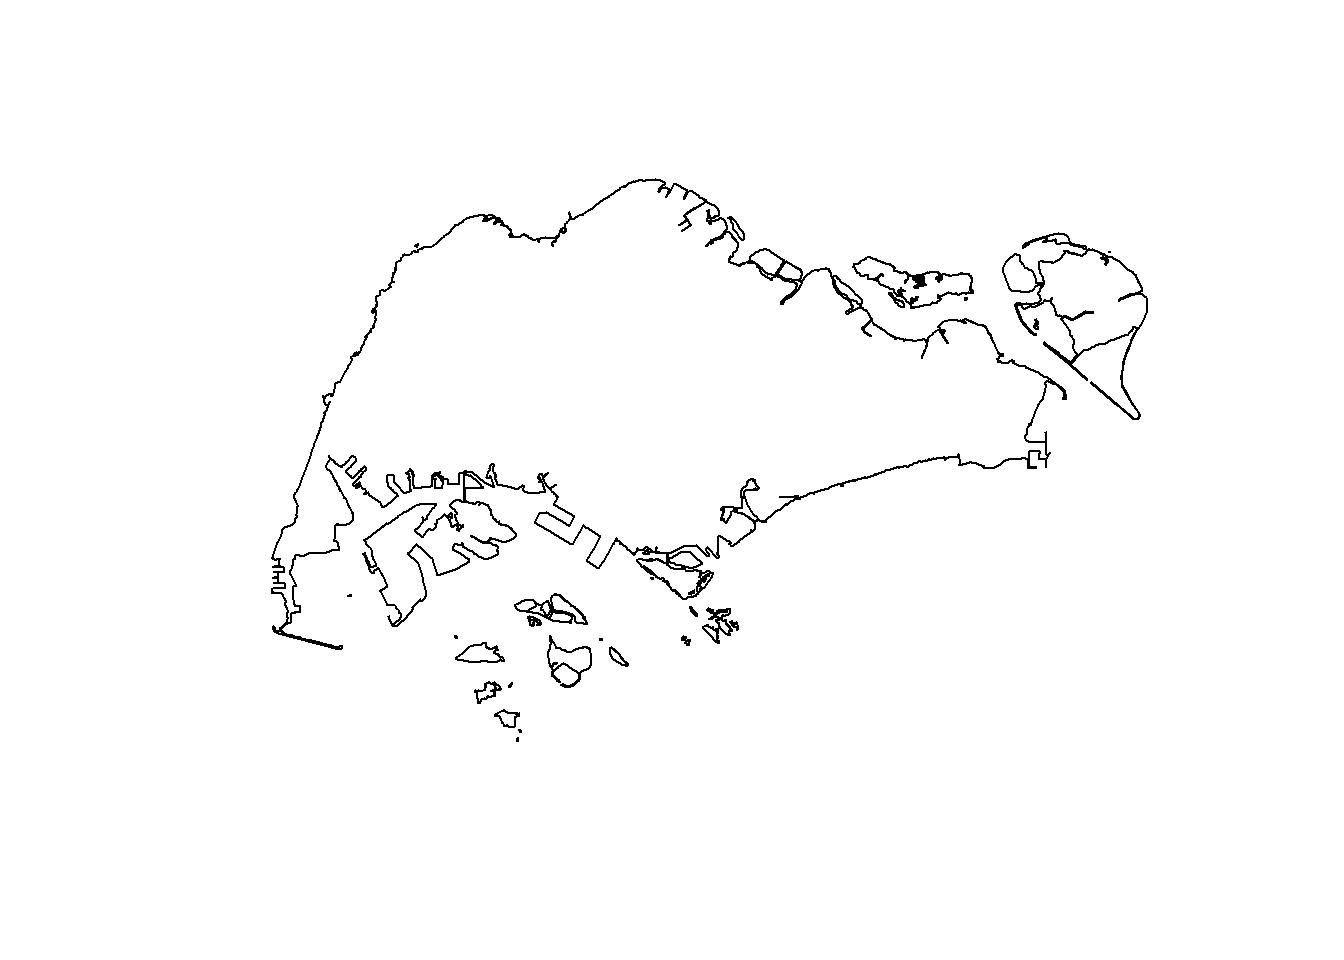 Outline of Singapore